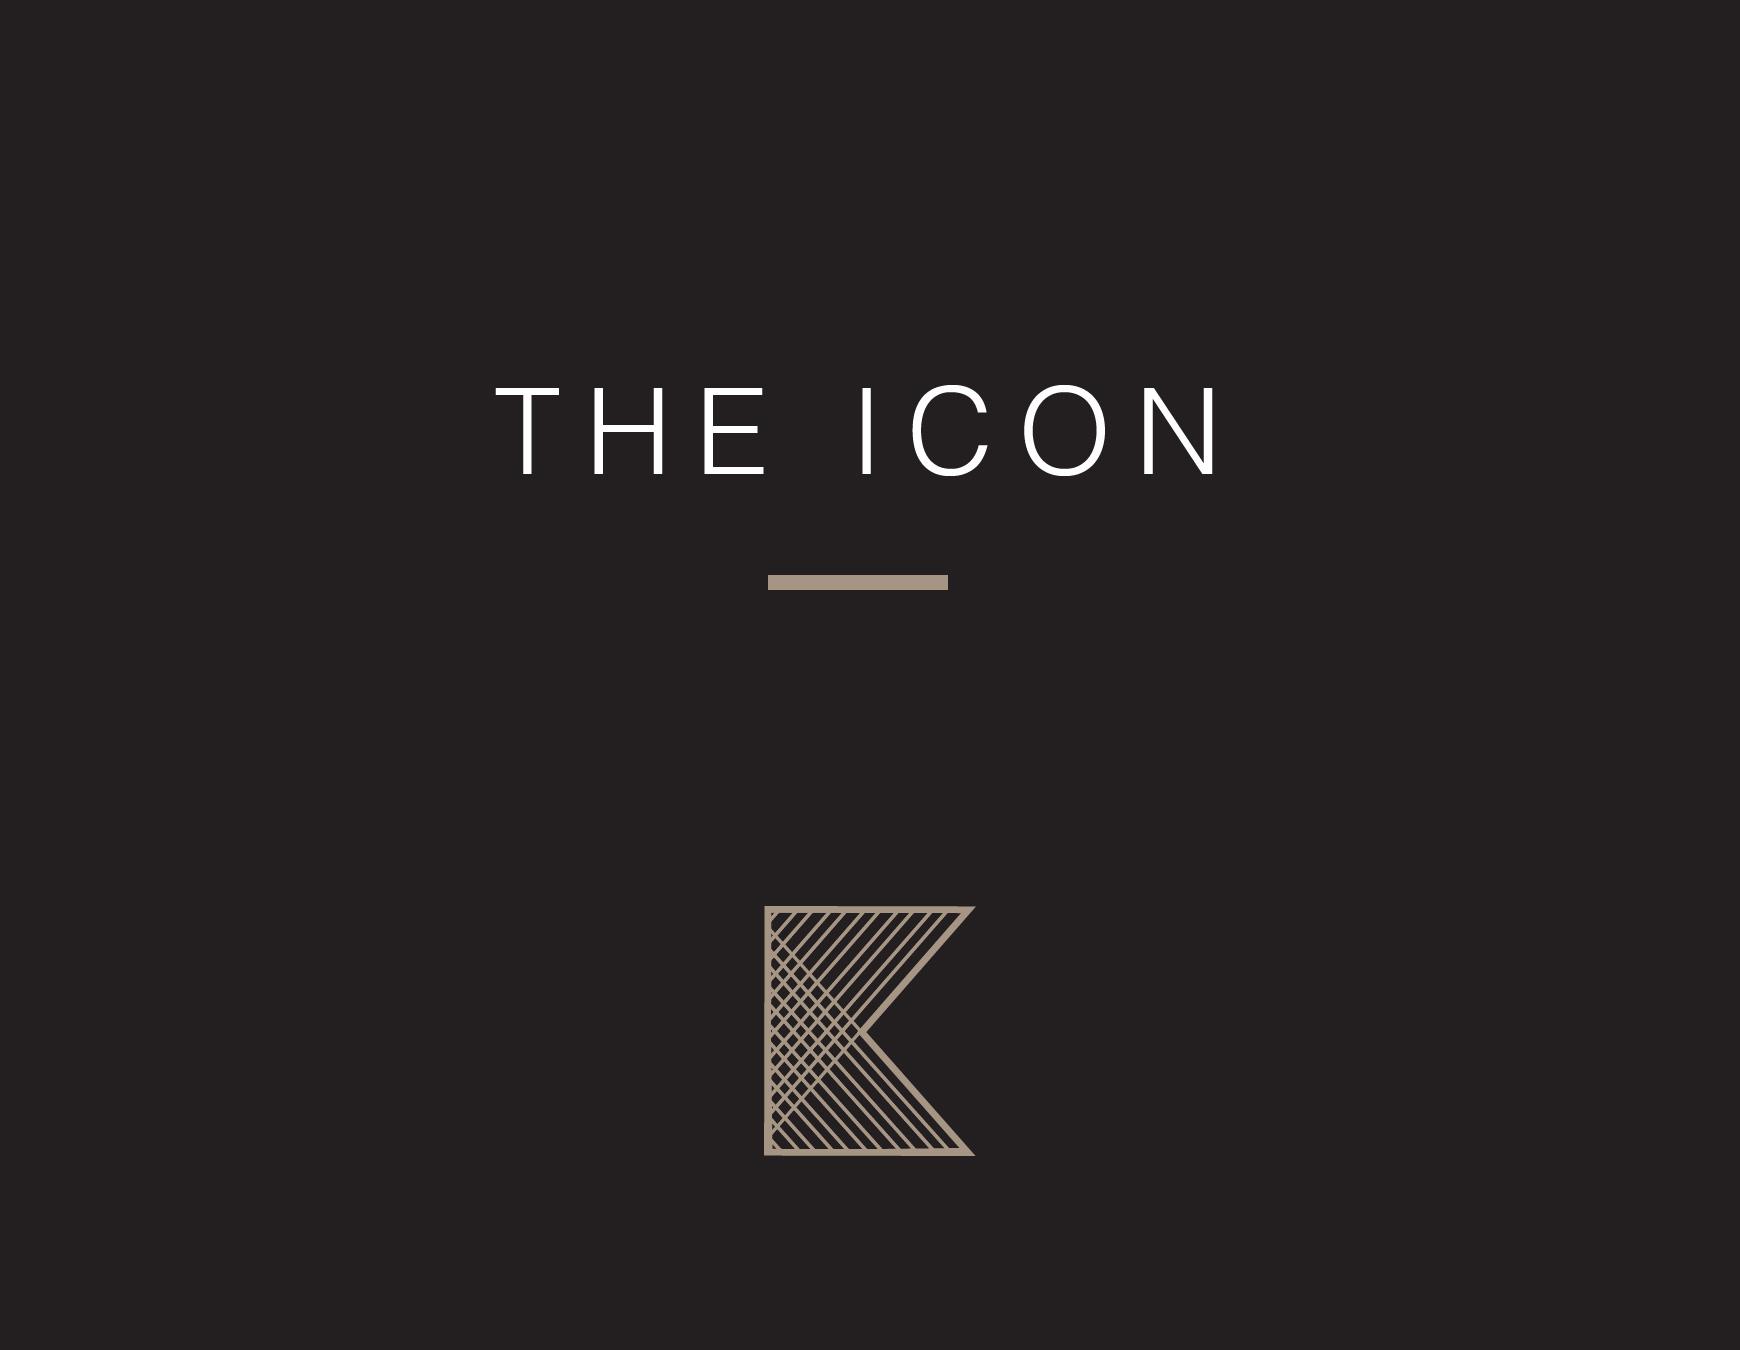 kohler-bold-design-award-the-icon-2018